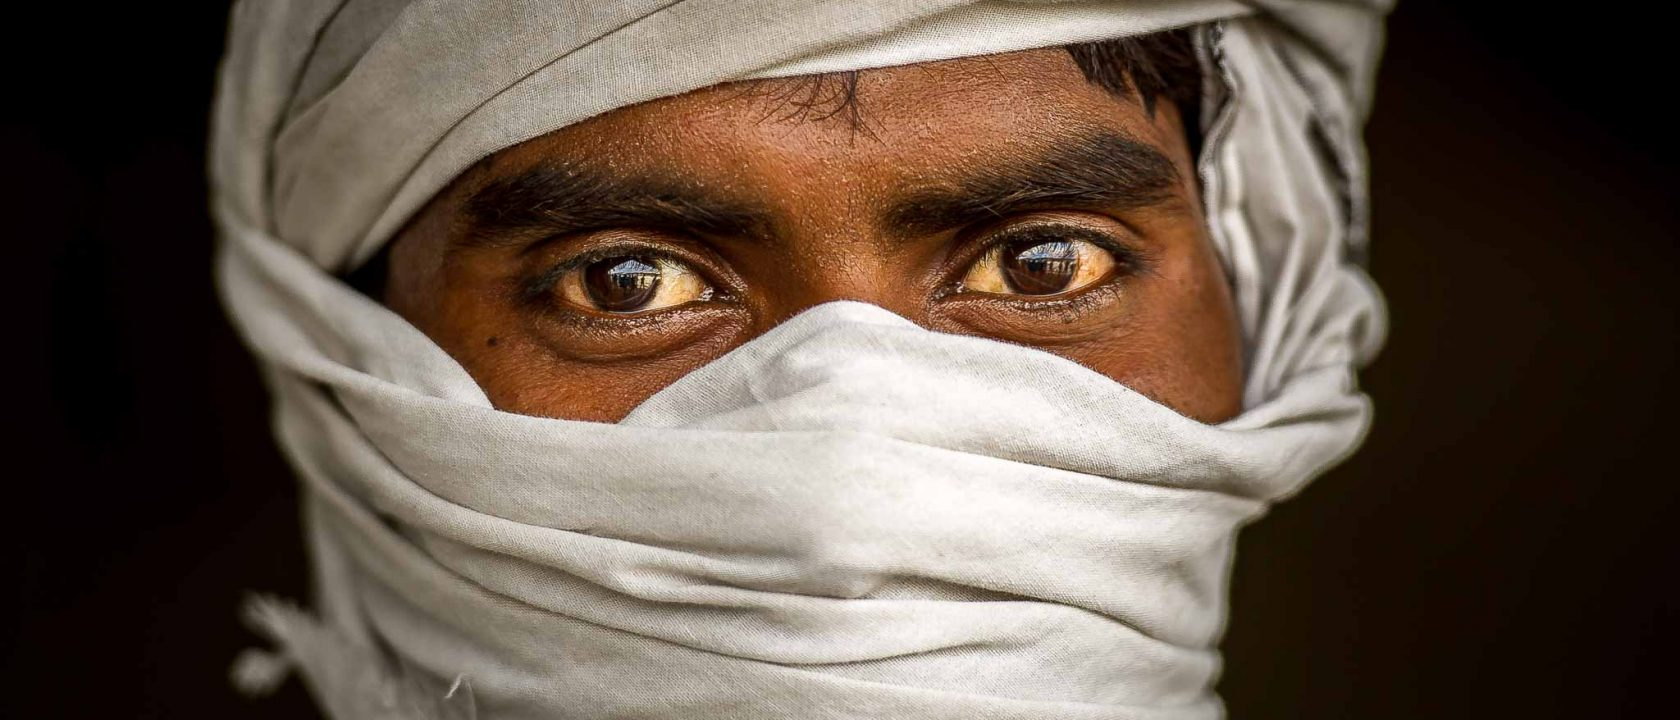 Reisefotografie - Menschen fotografieren